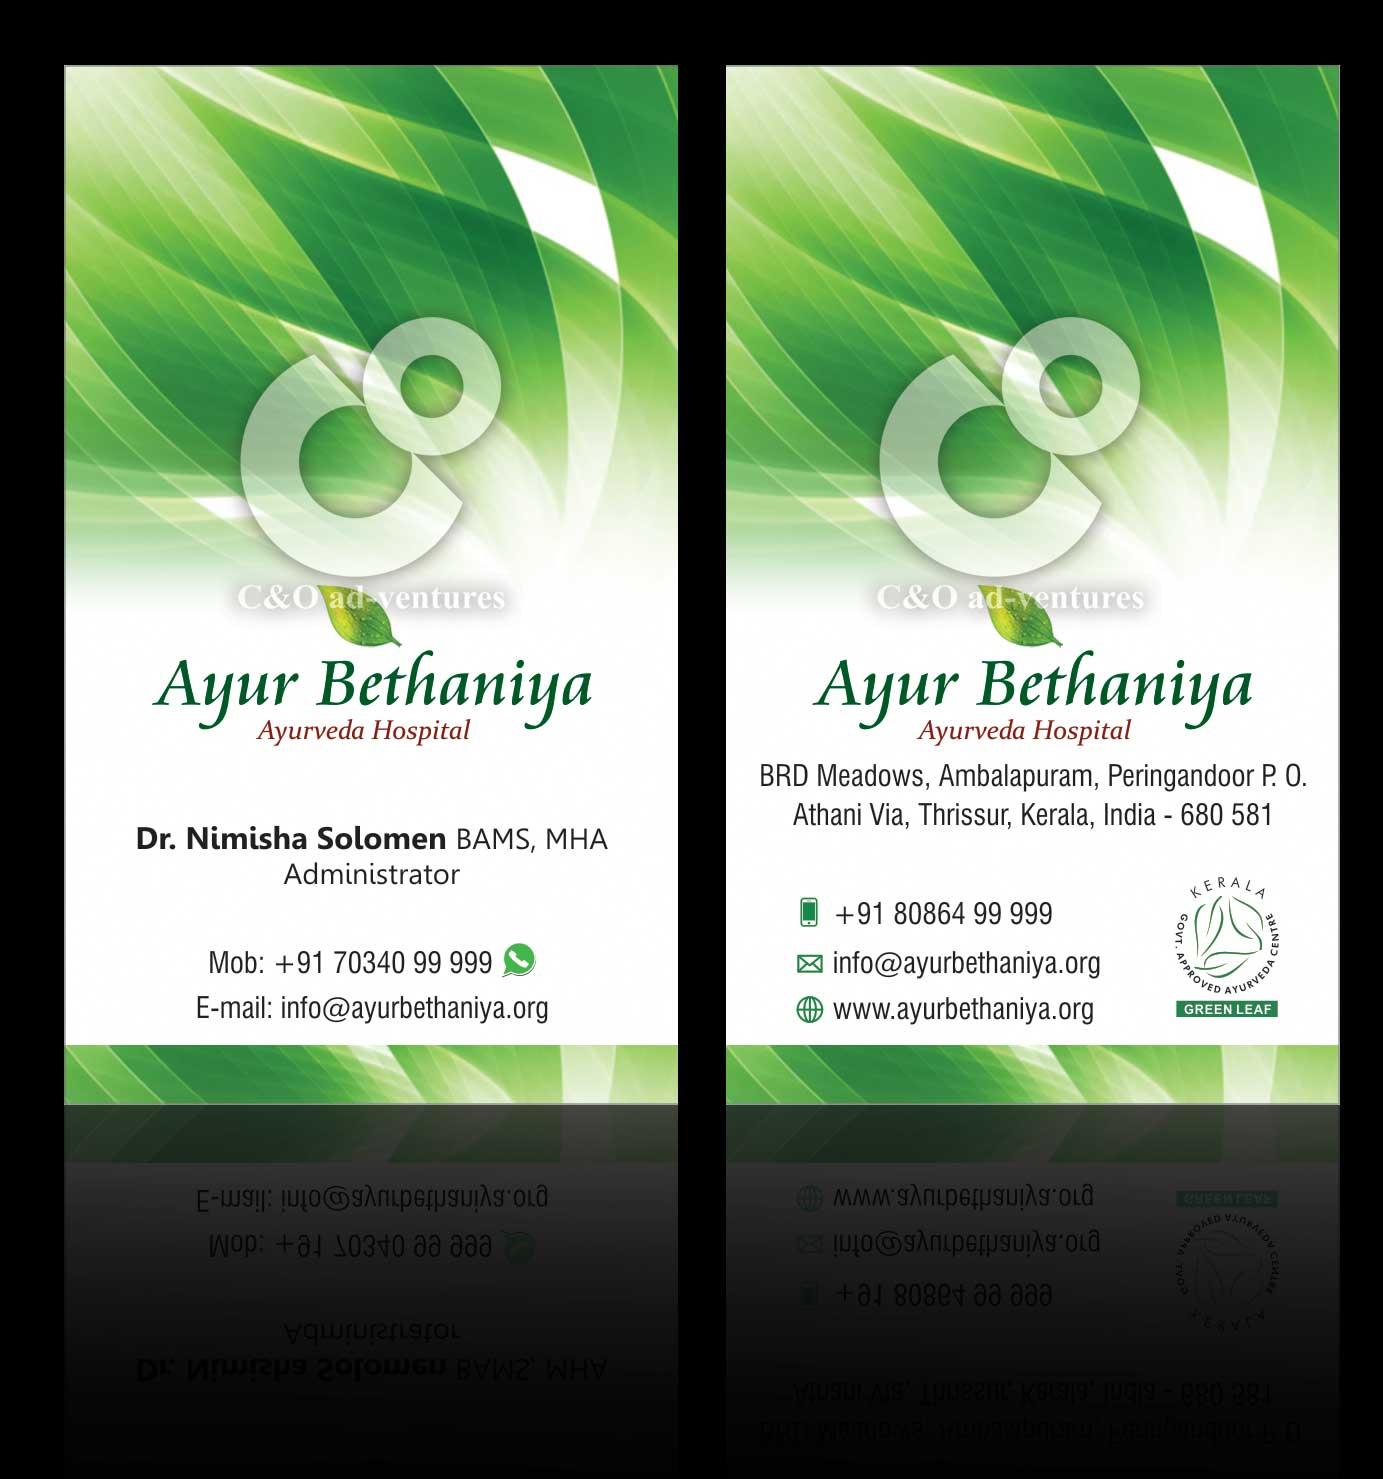 c amp o adventures business card for ayurveda hospital